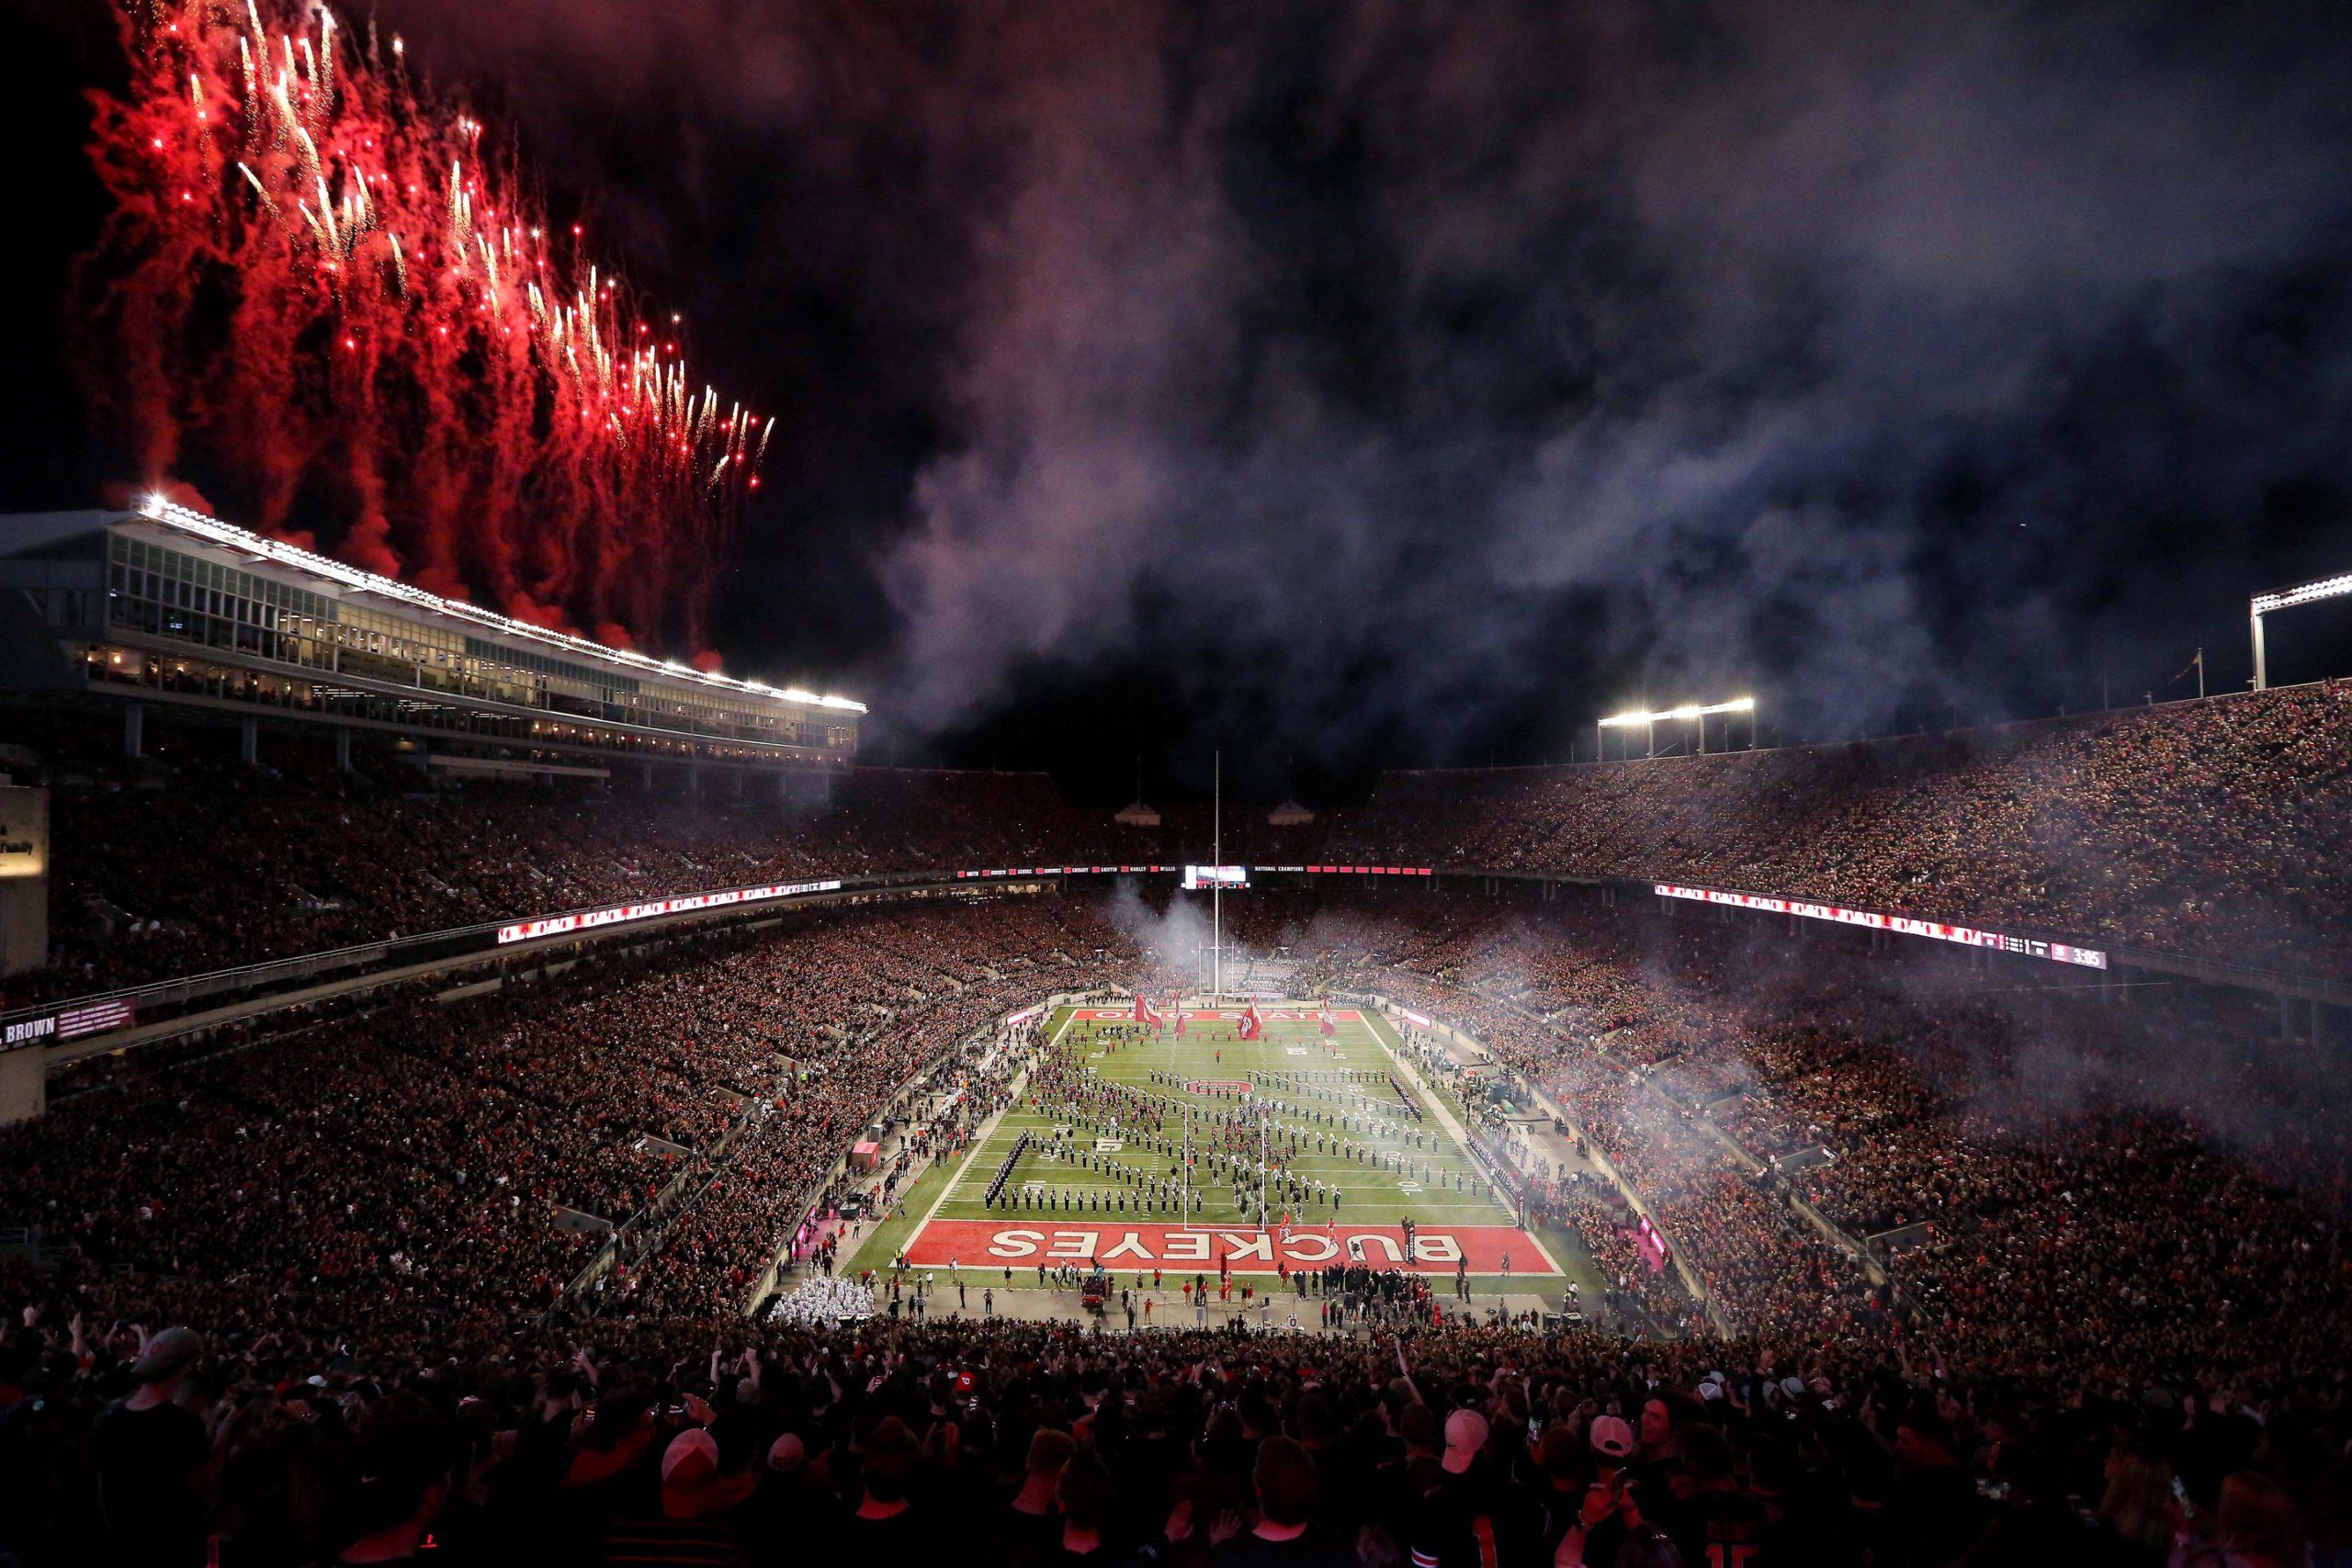 Ohio State-Buckeyes-Ohio State football-Horseshoe